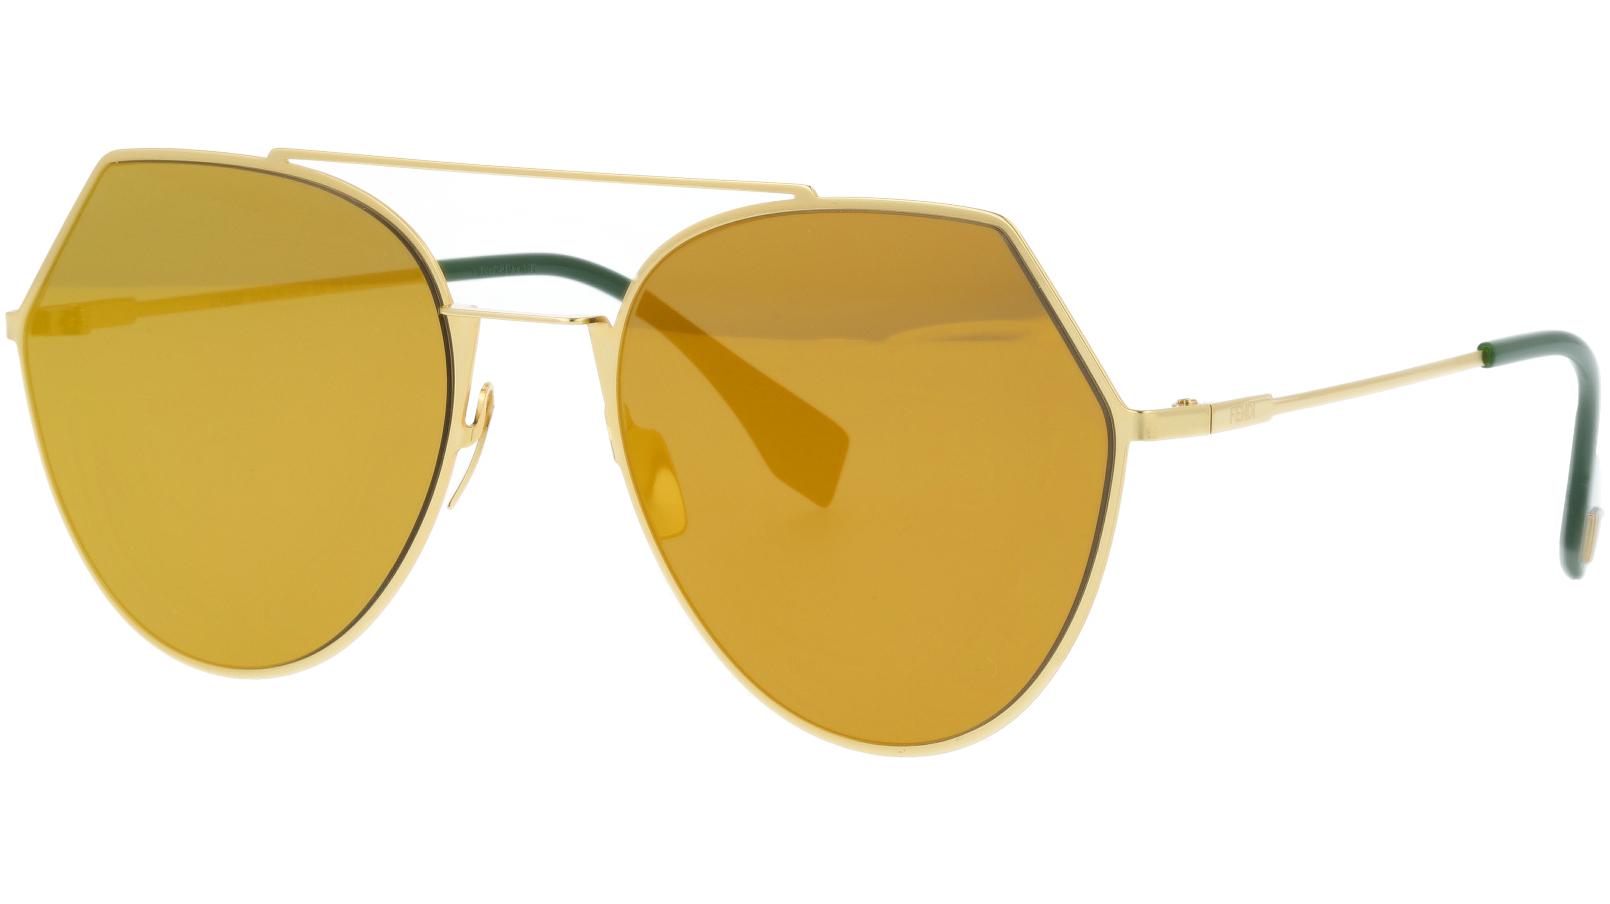 FENDI FF0194/S 00183 55 Yellow Gold Rim Sunglasses